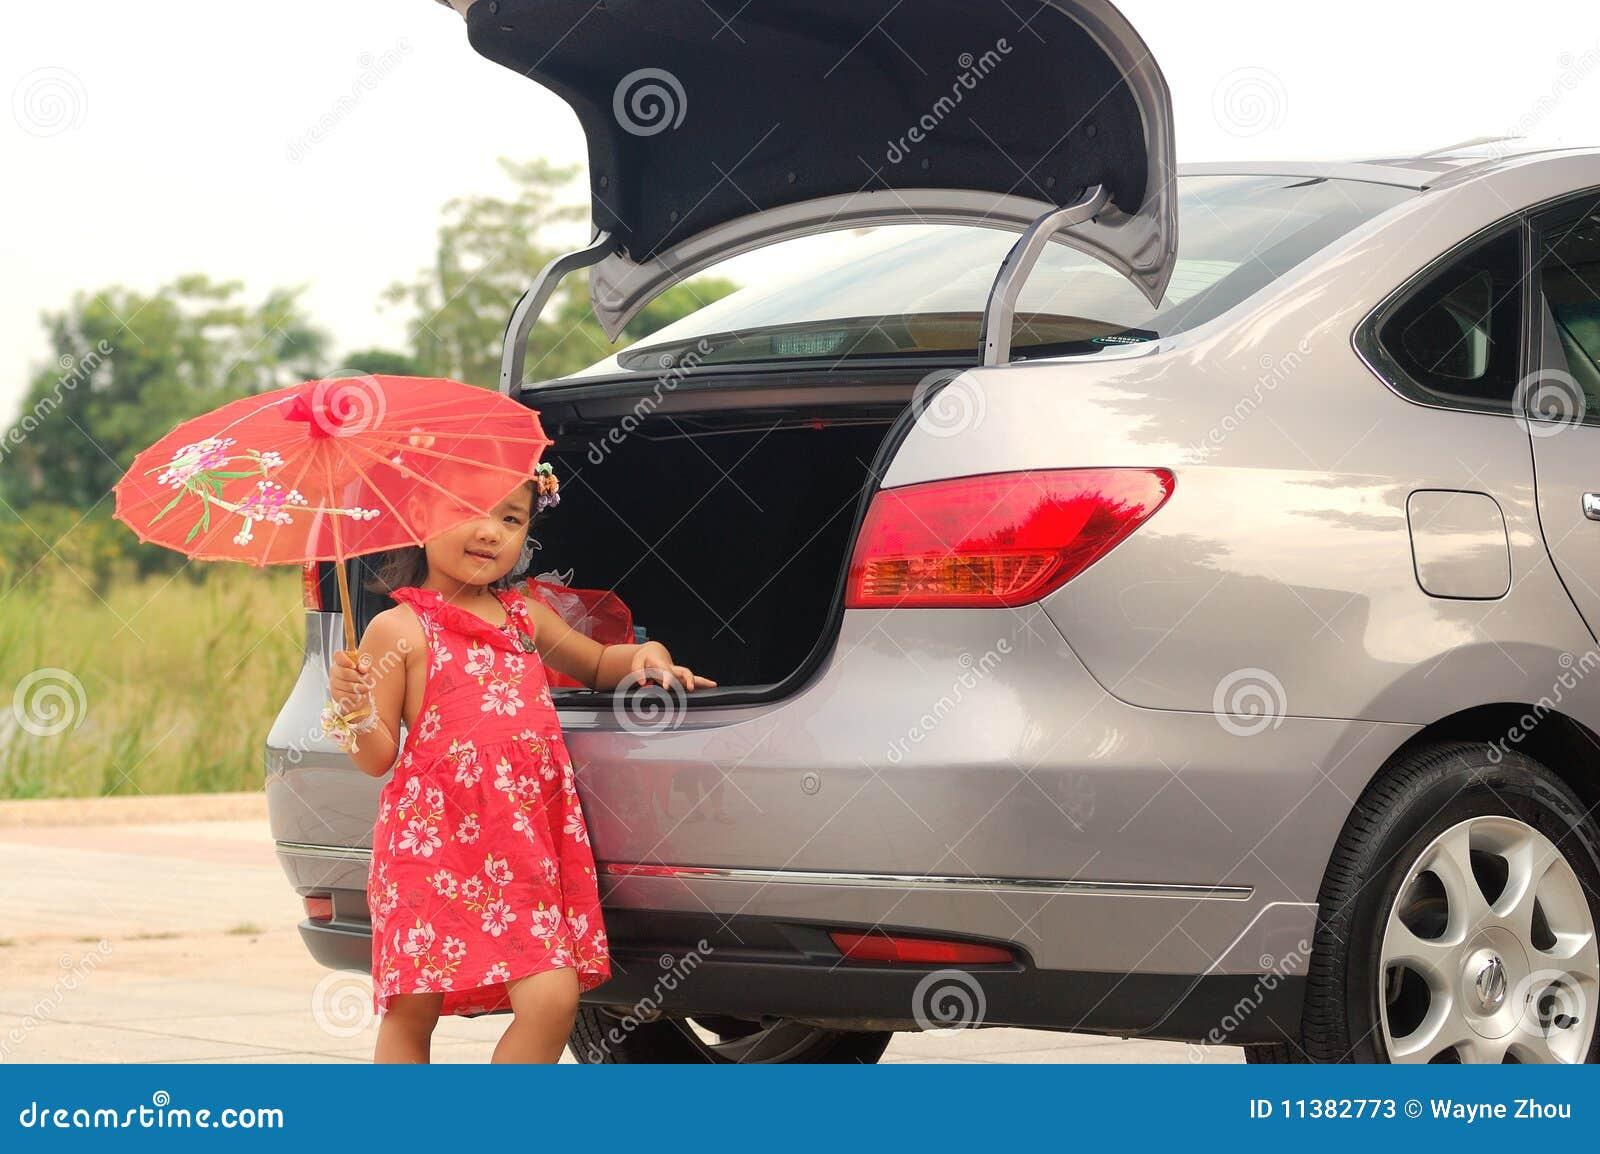 from Forrest little girls xxx in car